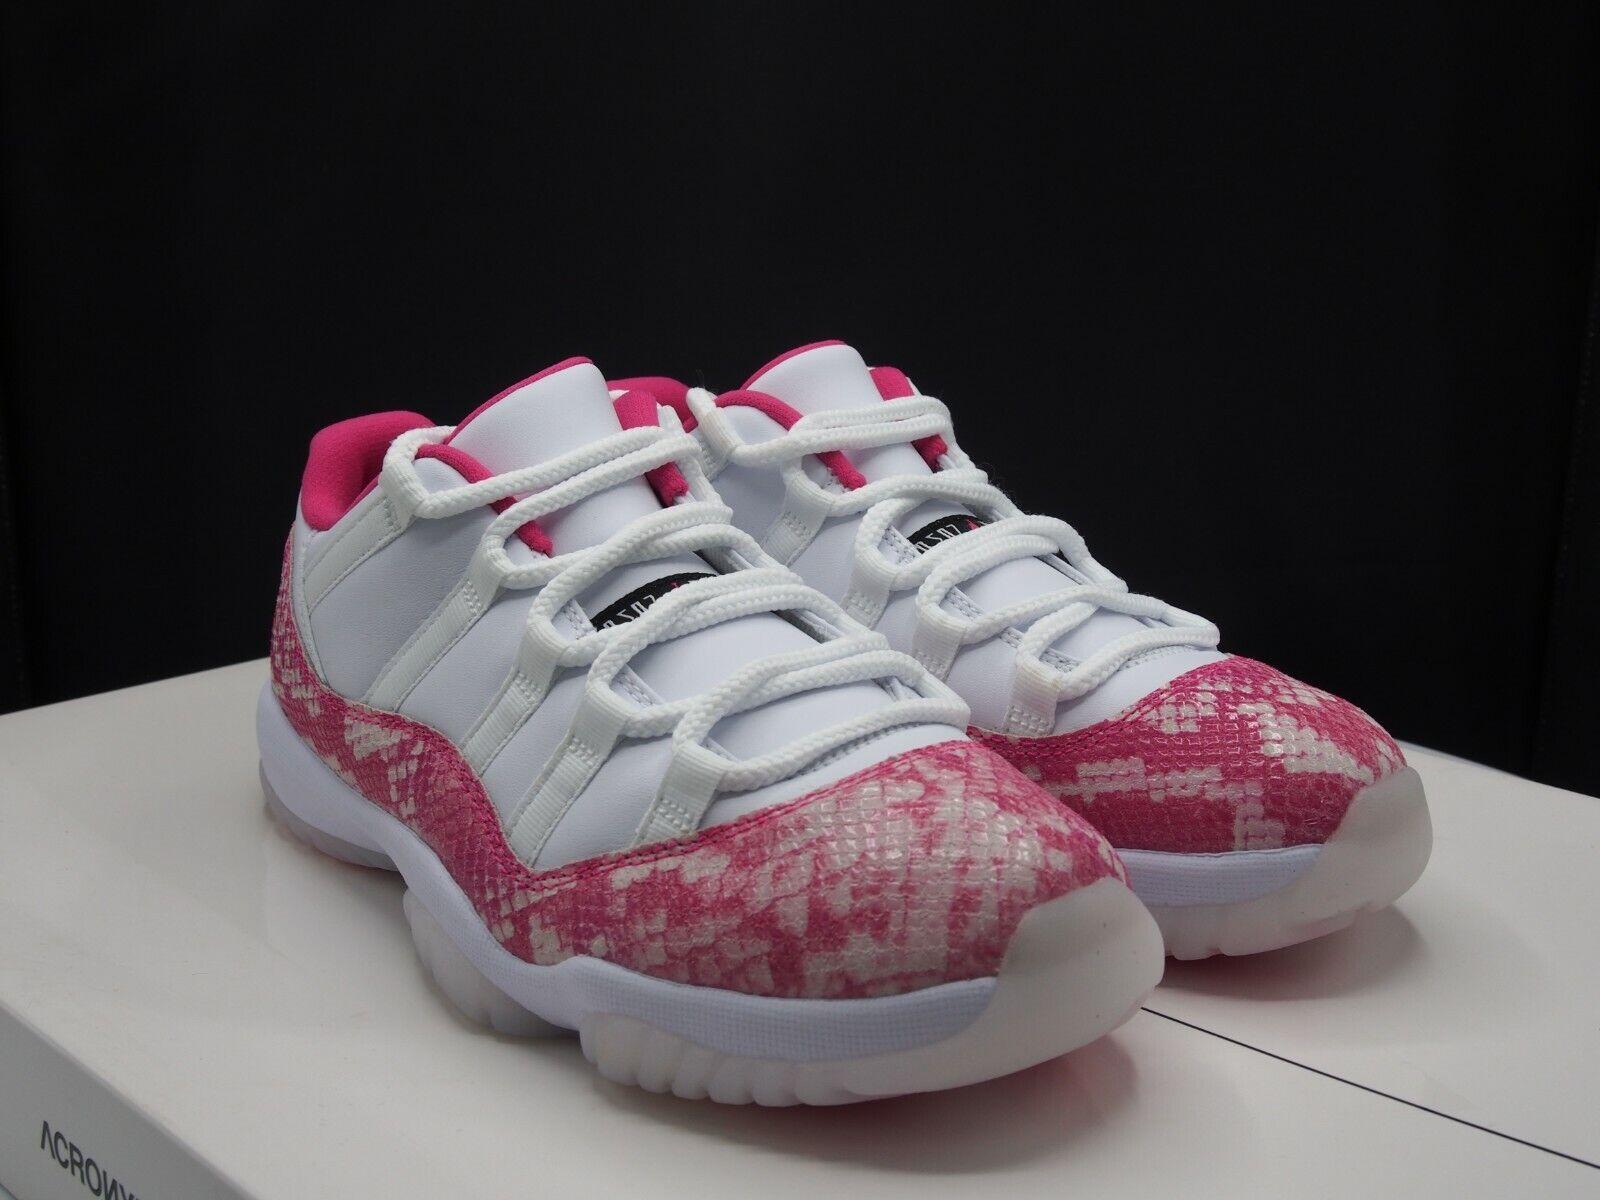 Nike Air Jordan XI 11 Retro Low \